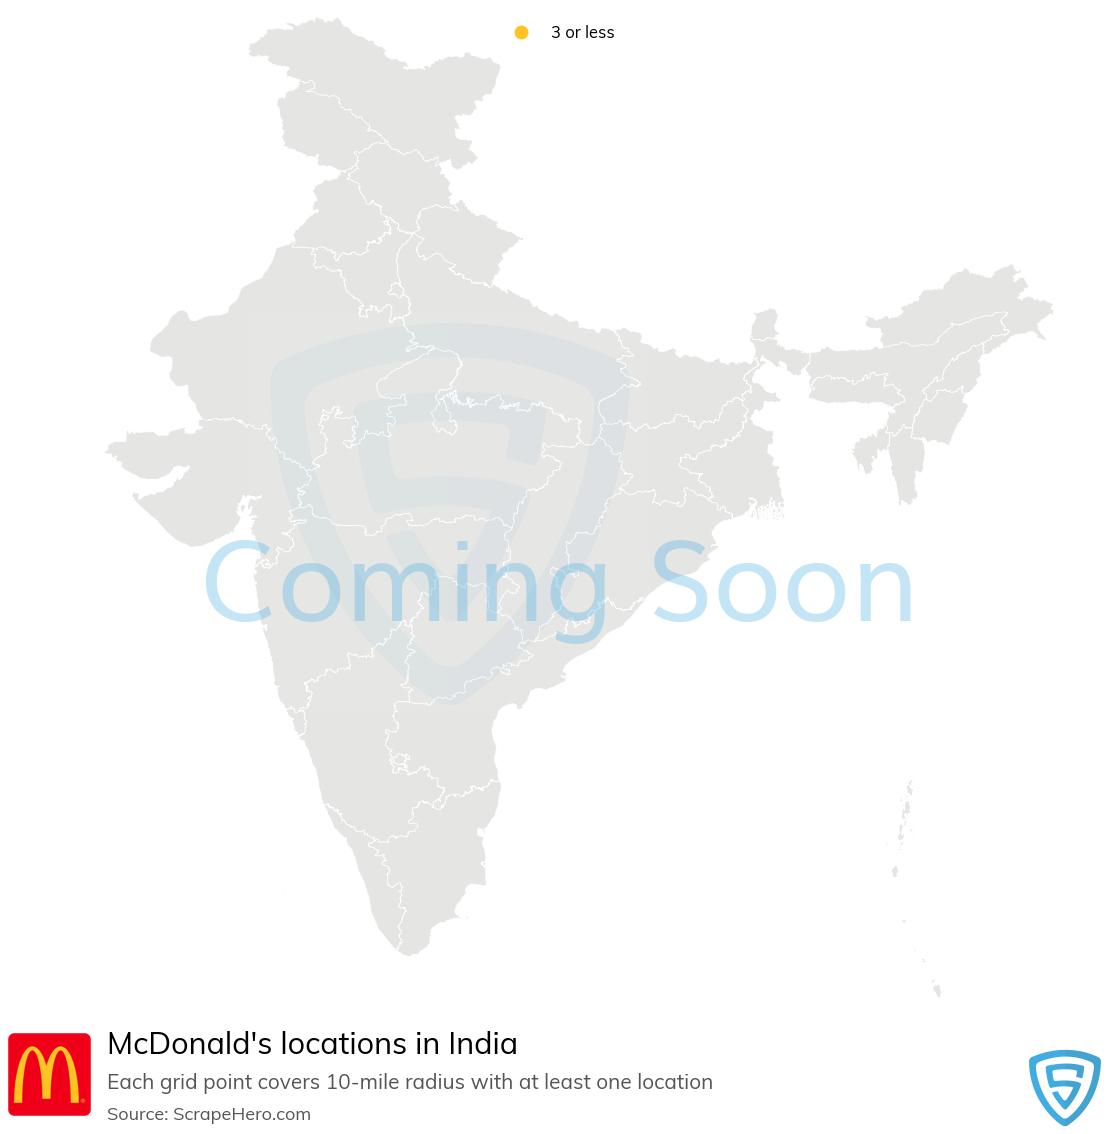 McDonalds Store locations in India